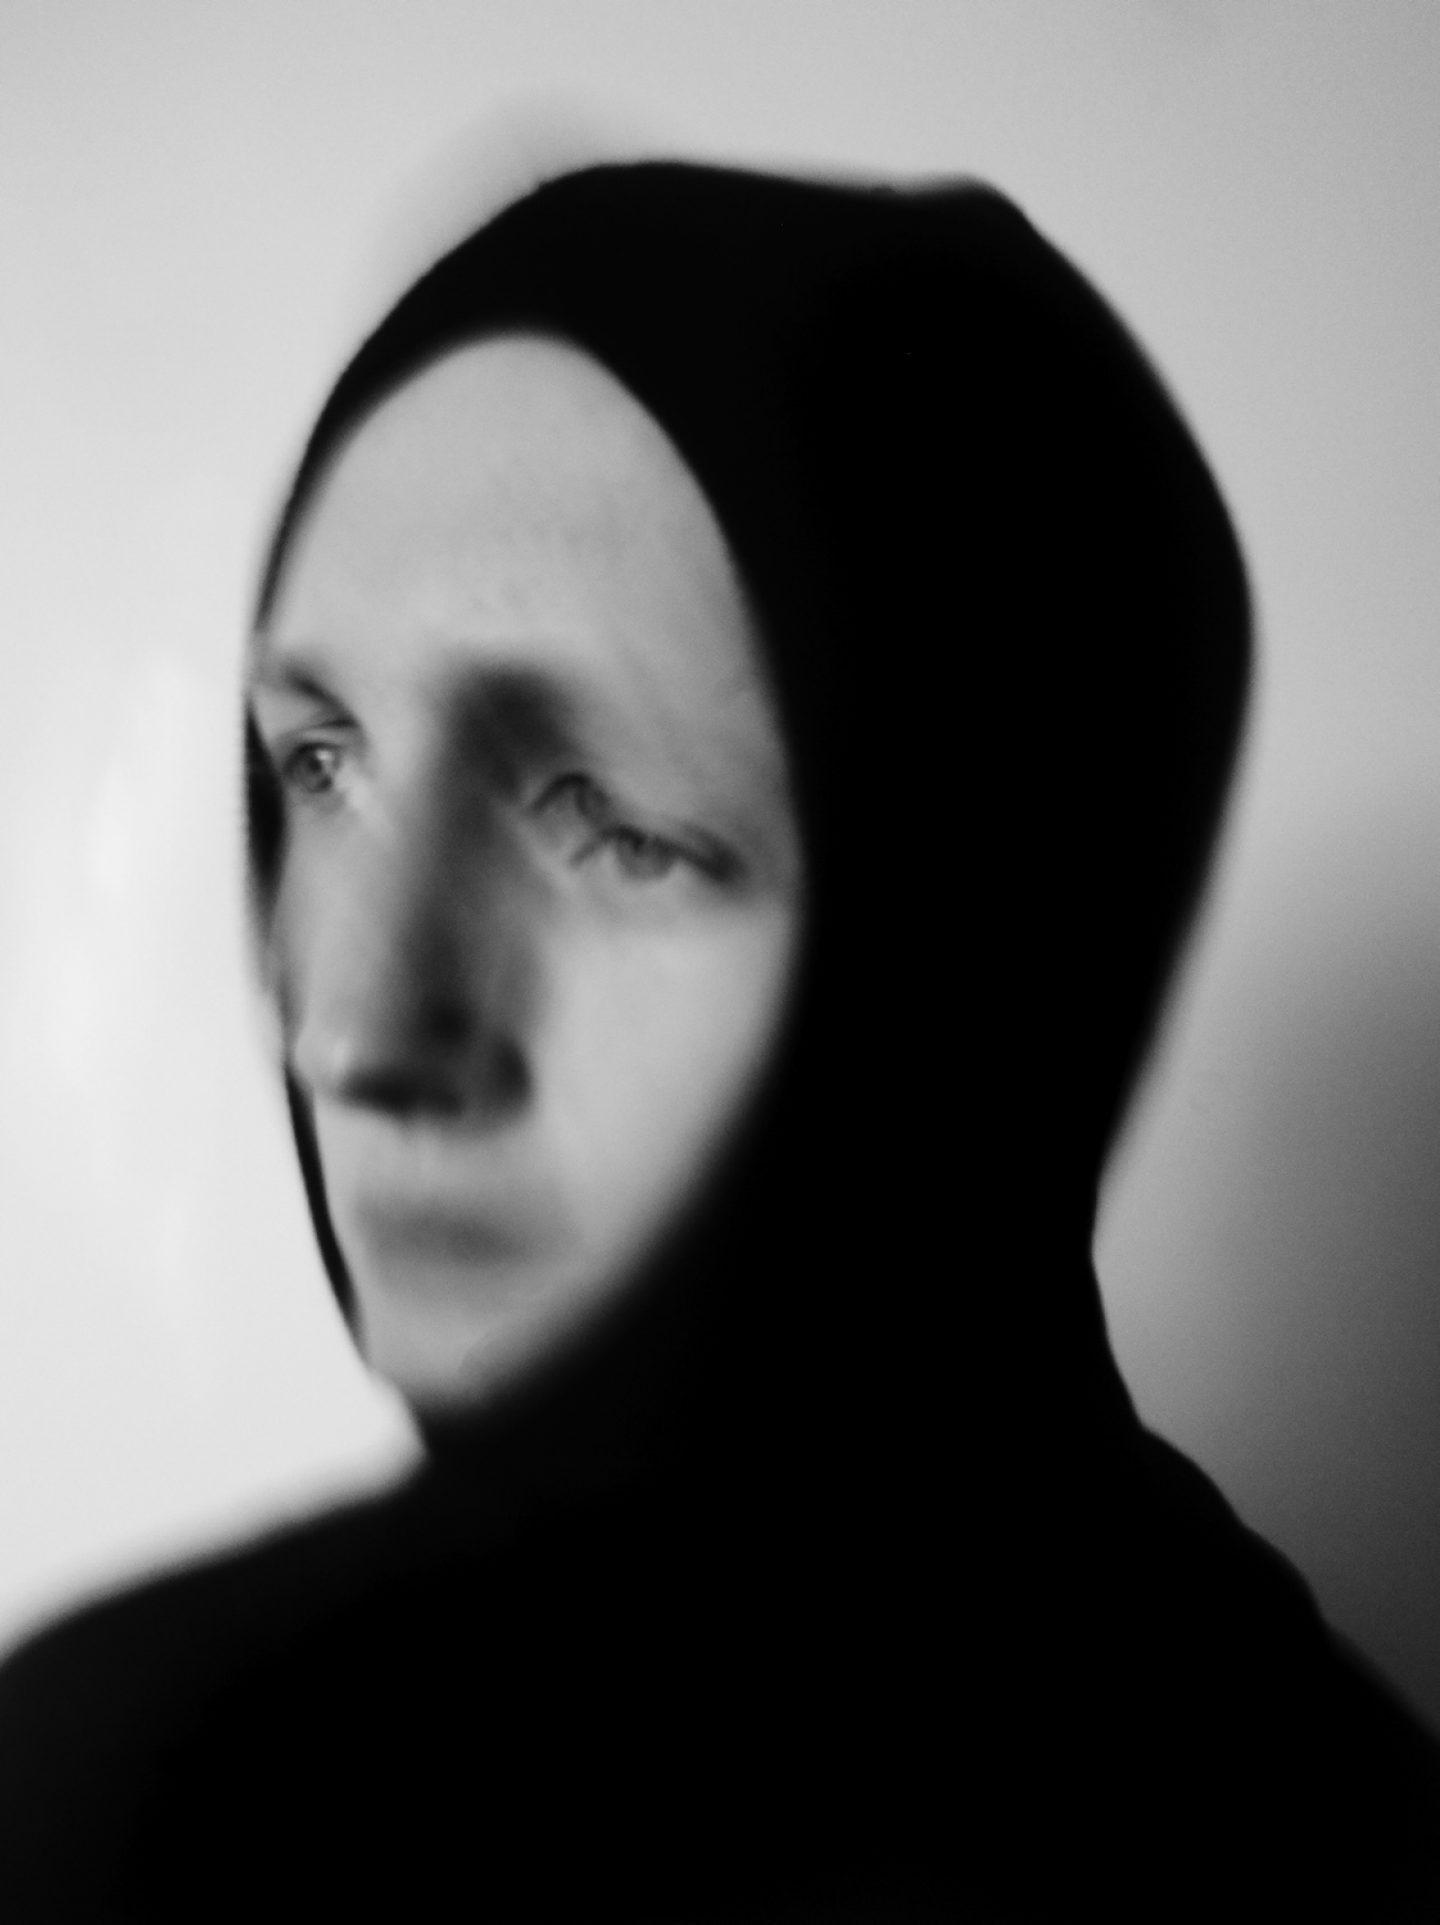 IGNANT-Photography-Jack-Davison-Recent-018